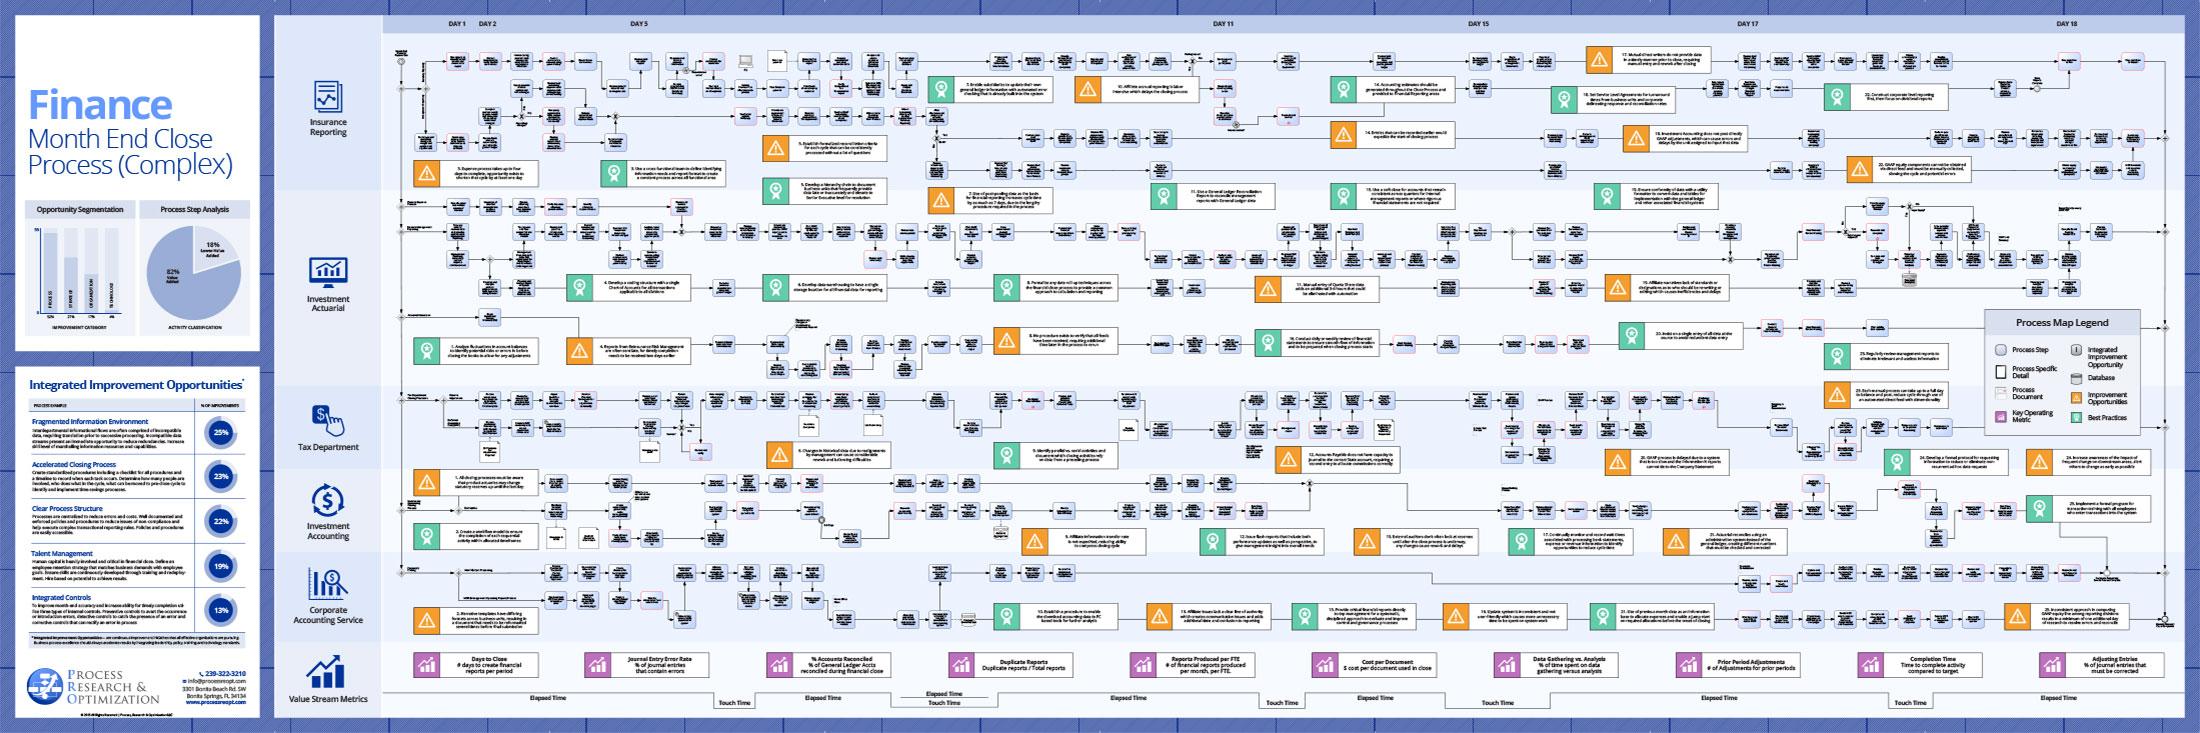 LP Finance 01 | Process, Research & Optimization